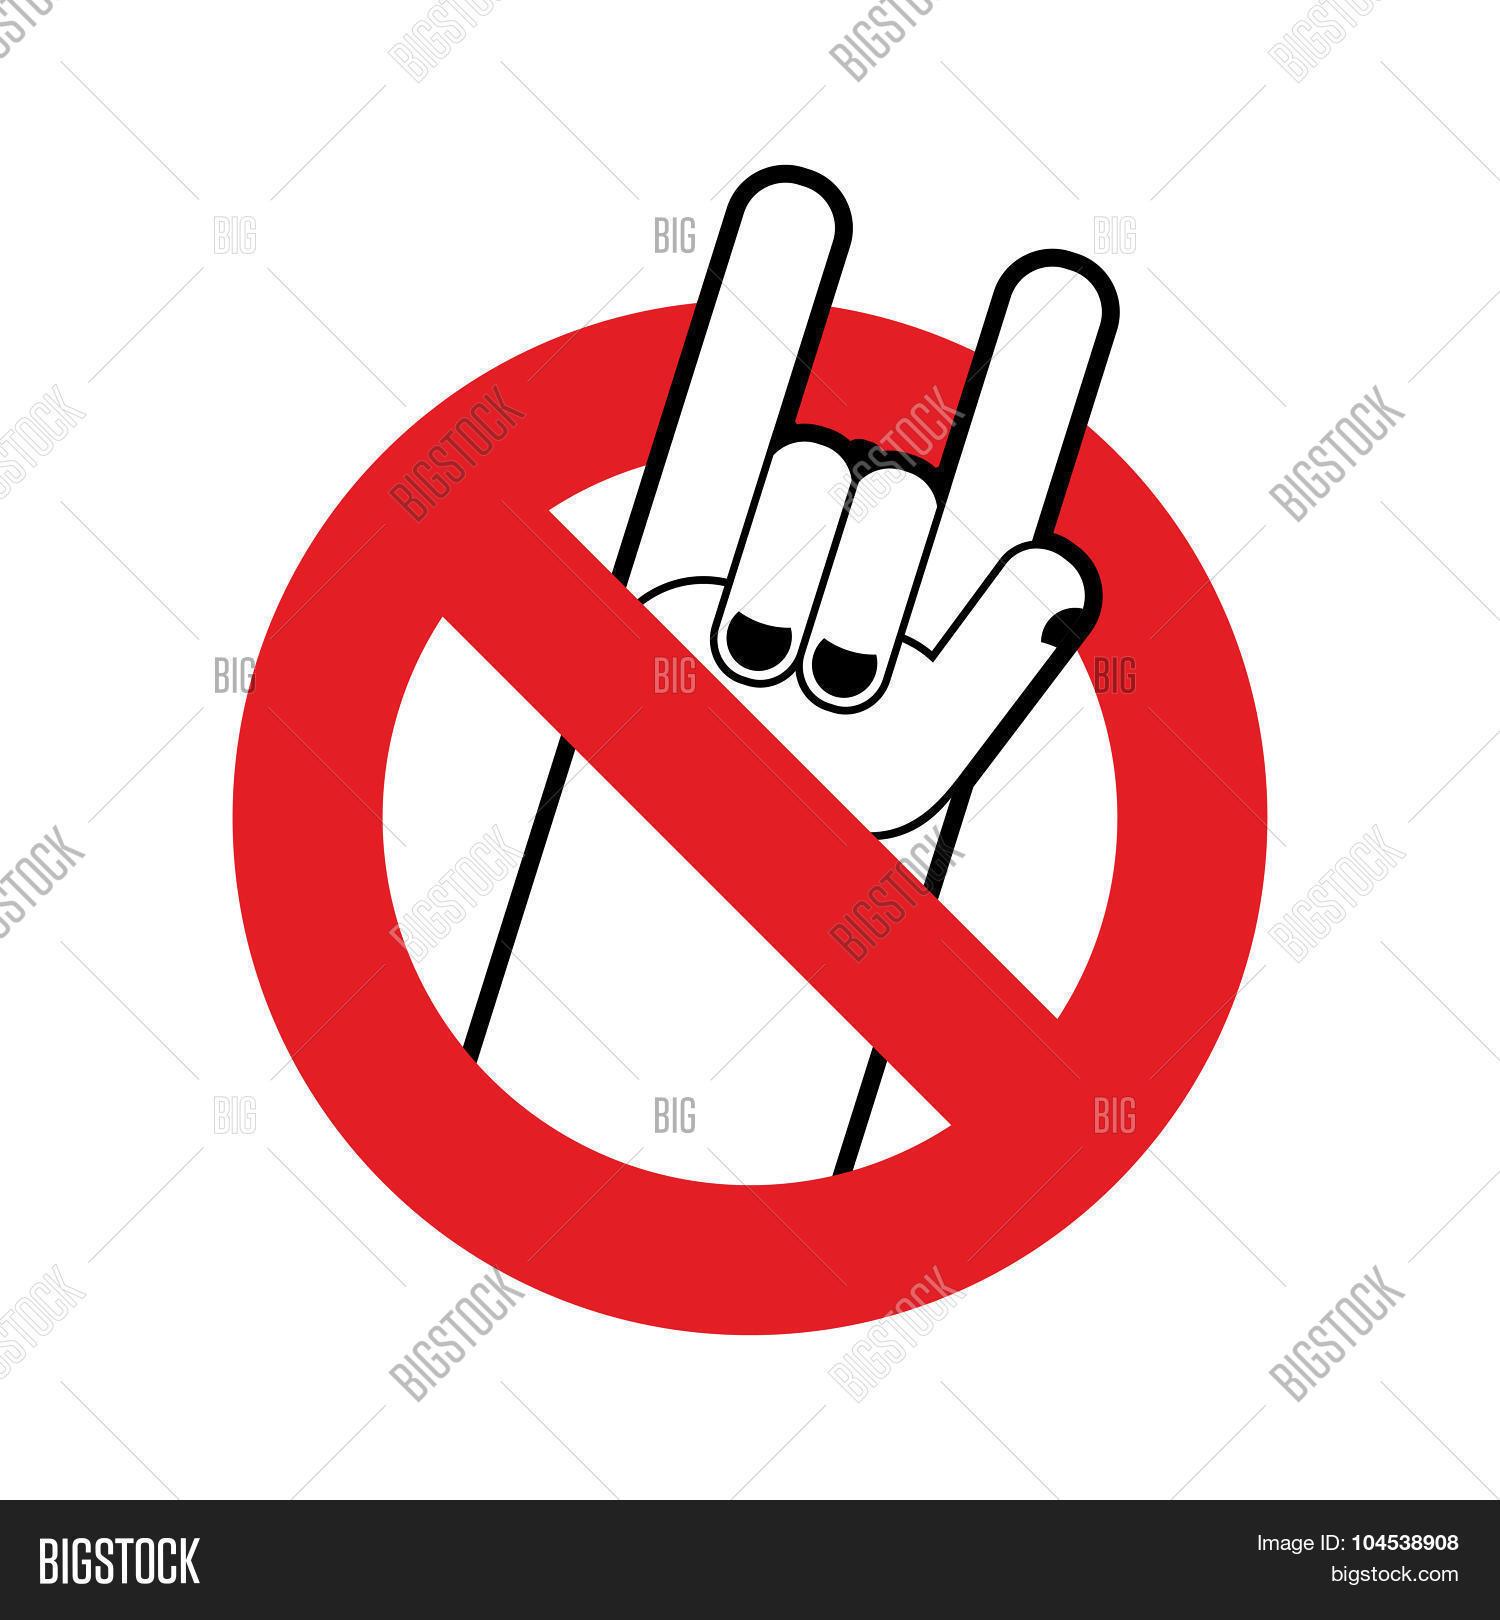 Stop rock ban lovers rock music vector photo bigstock stop rock ban for lovers of rock music red forbidding character forbidden rock buycottarizona